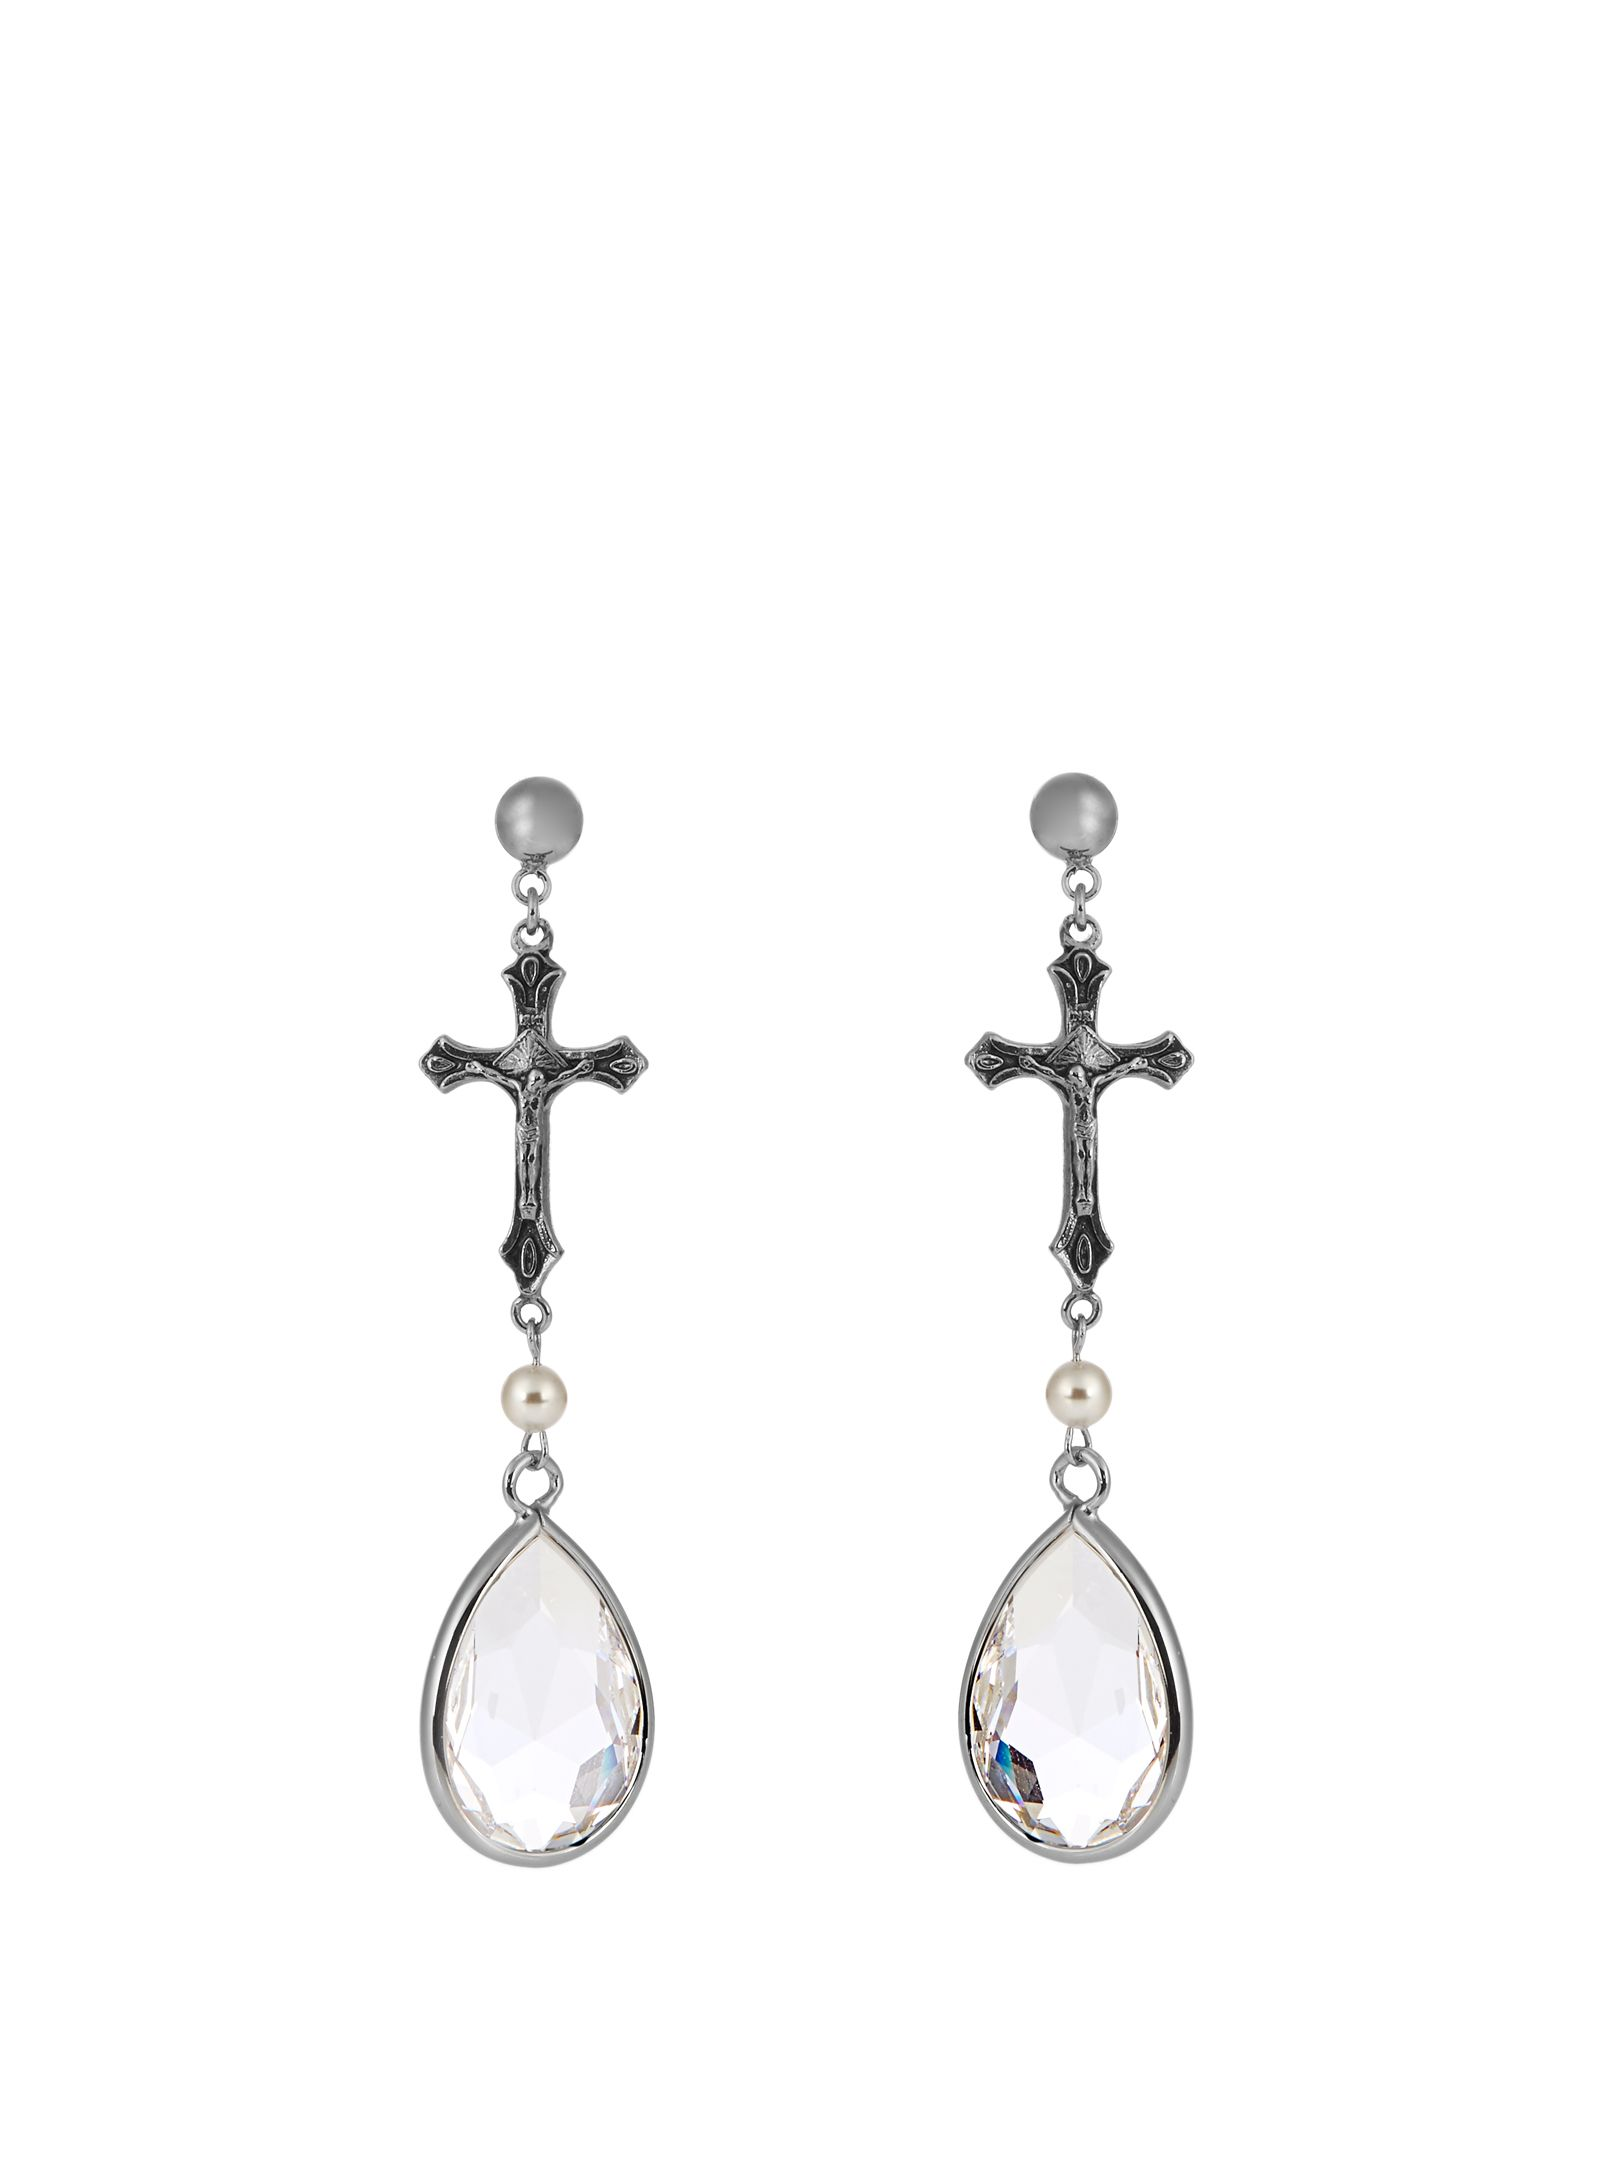 Crystal-embellished earrings   Givenchy   MATCHESFASHION.COM US